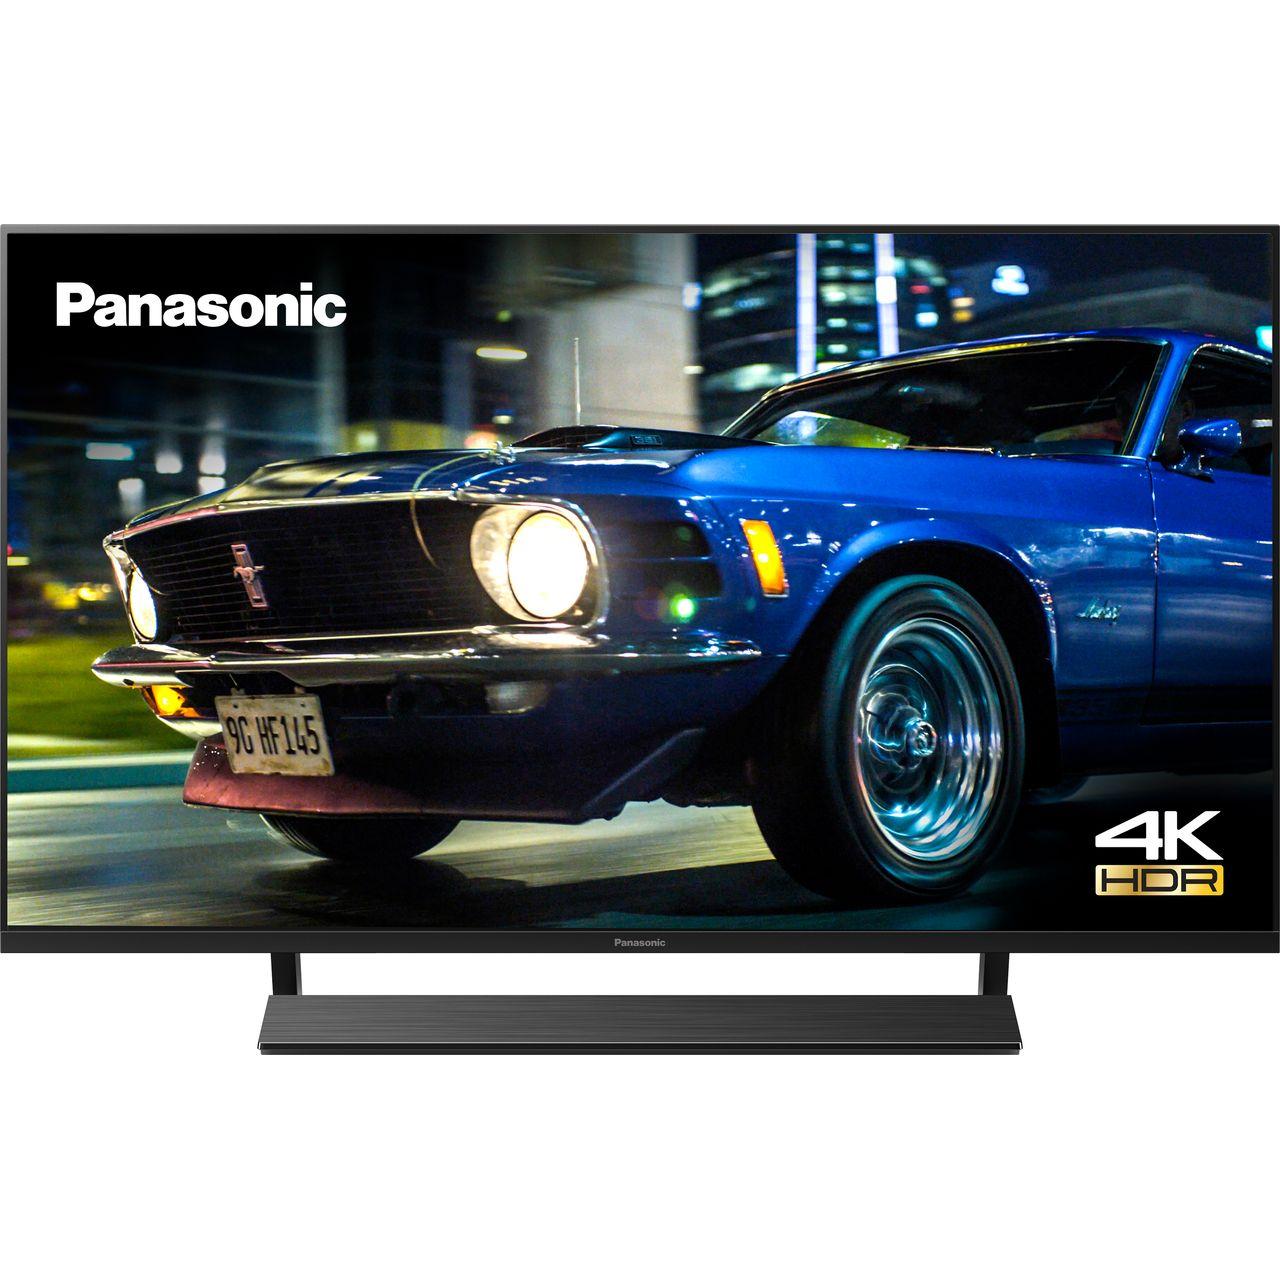 "Panasonic TX-65HX800B 65"" 4K HDR UHD Smart LED TV, Dolby Vision & Dolby Atmos - £749 @ AO"